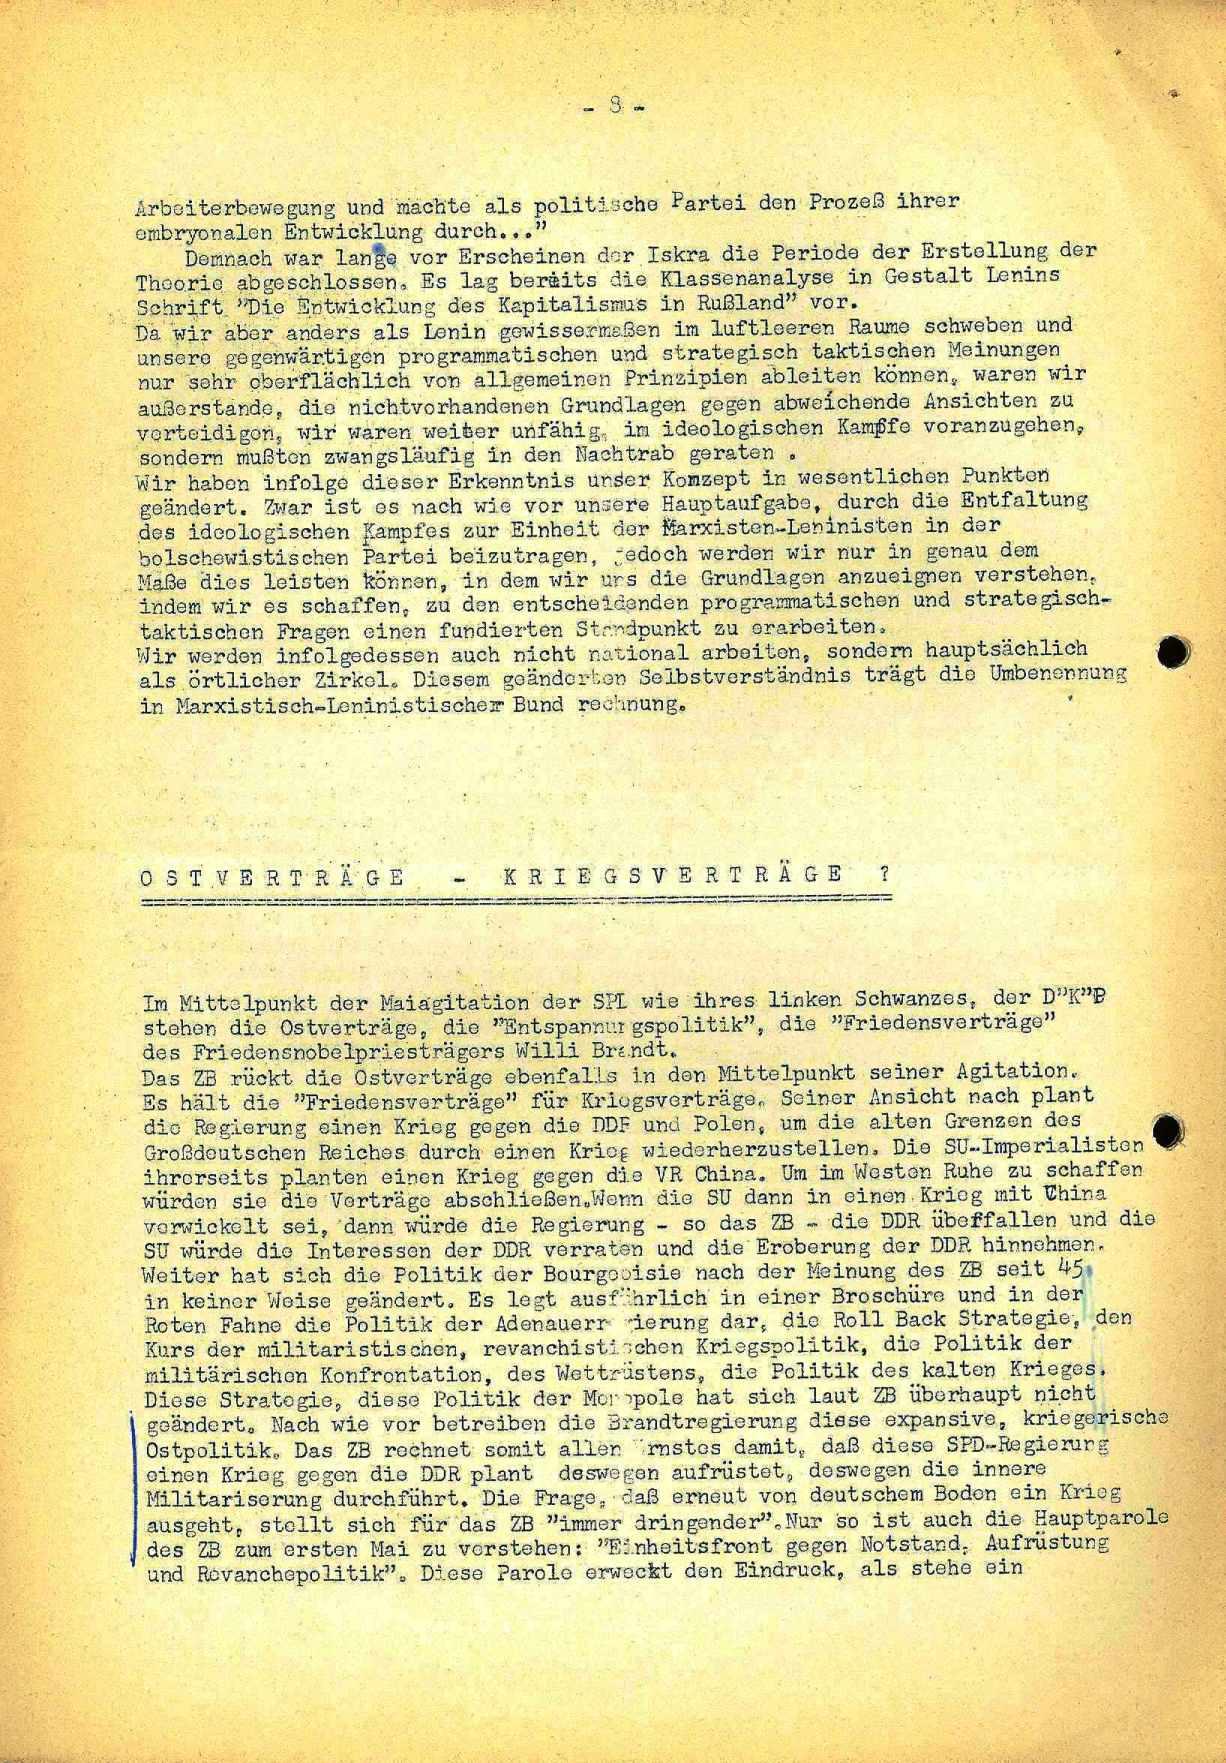 Weinfurth142